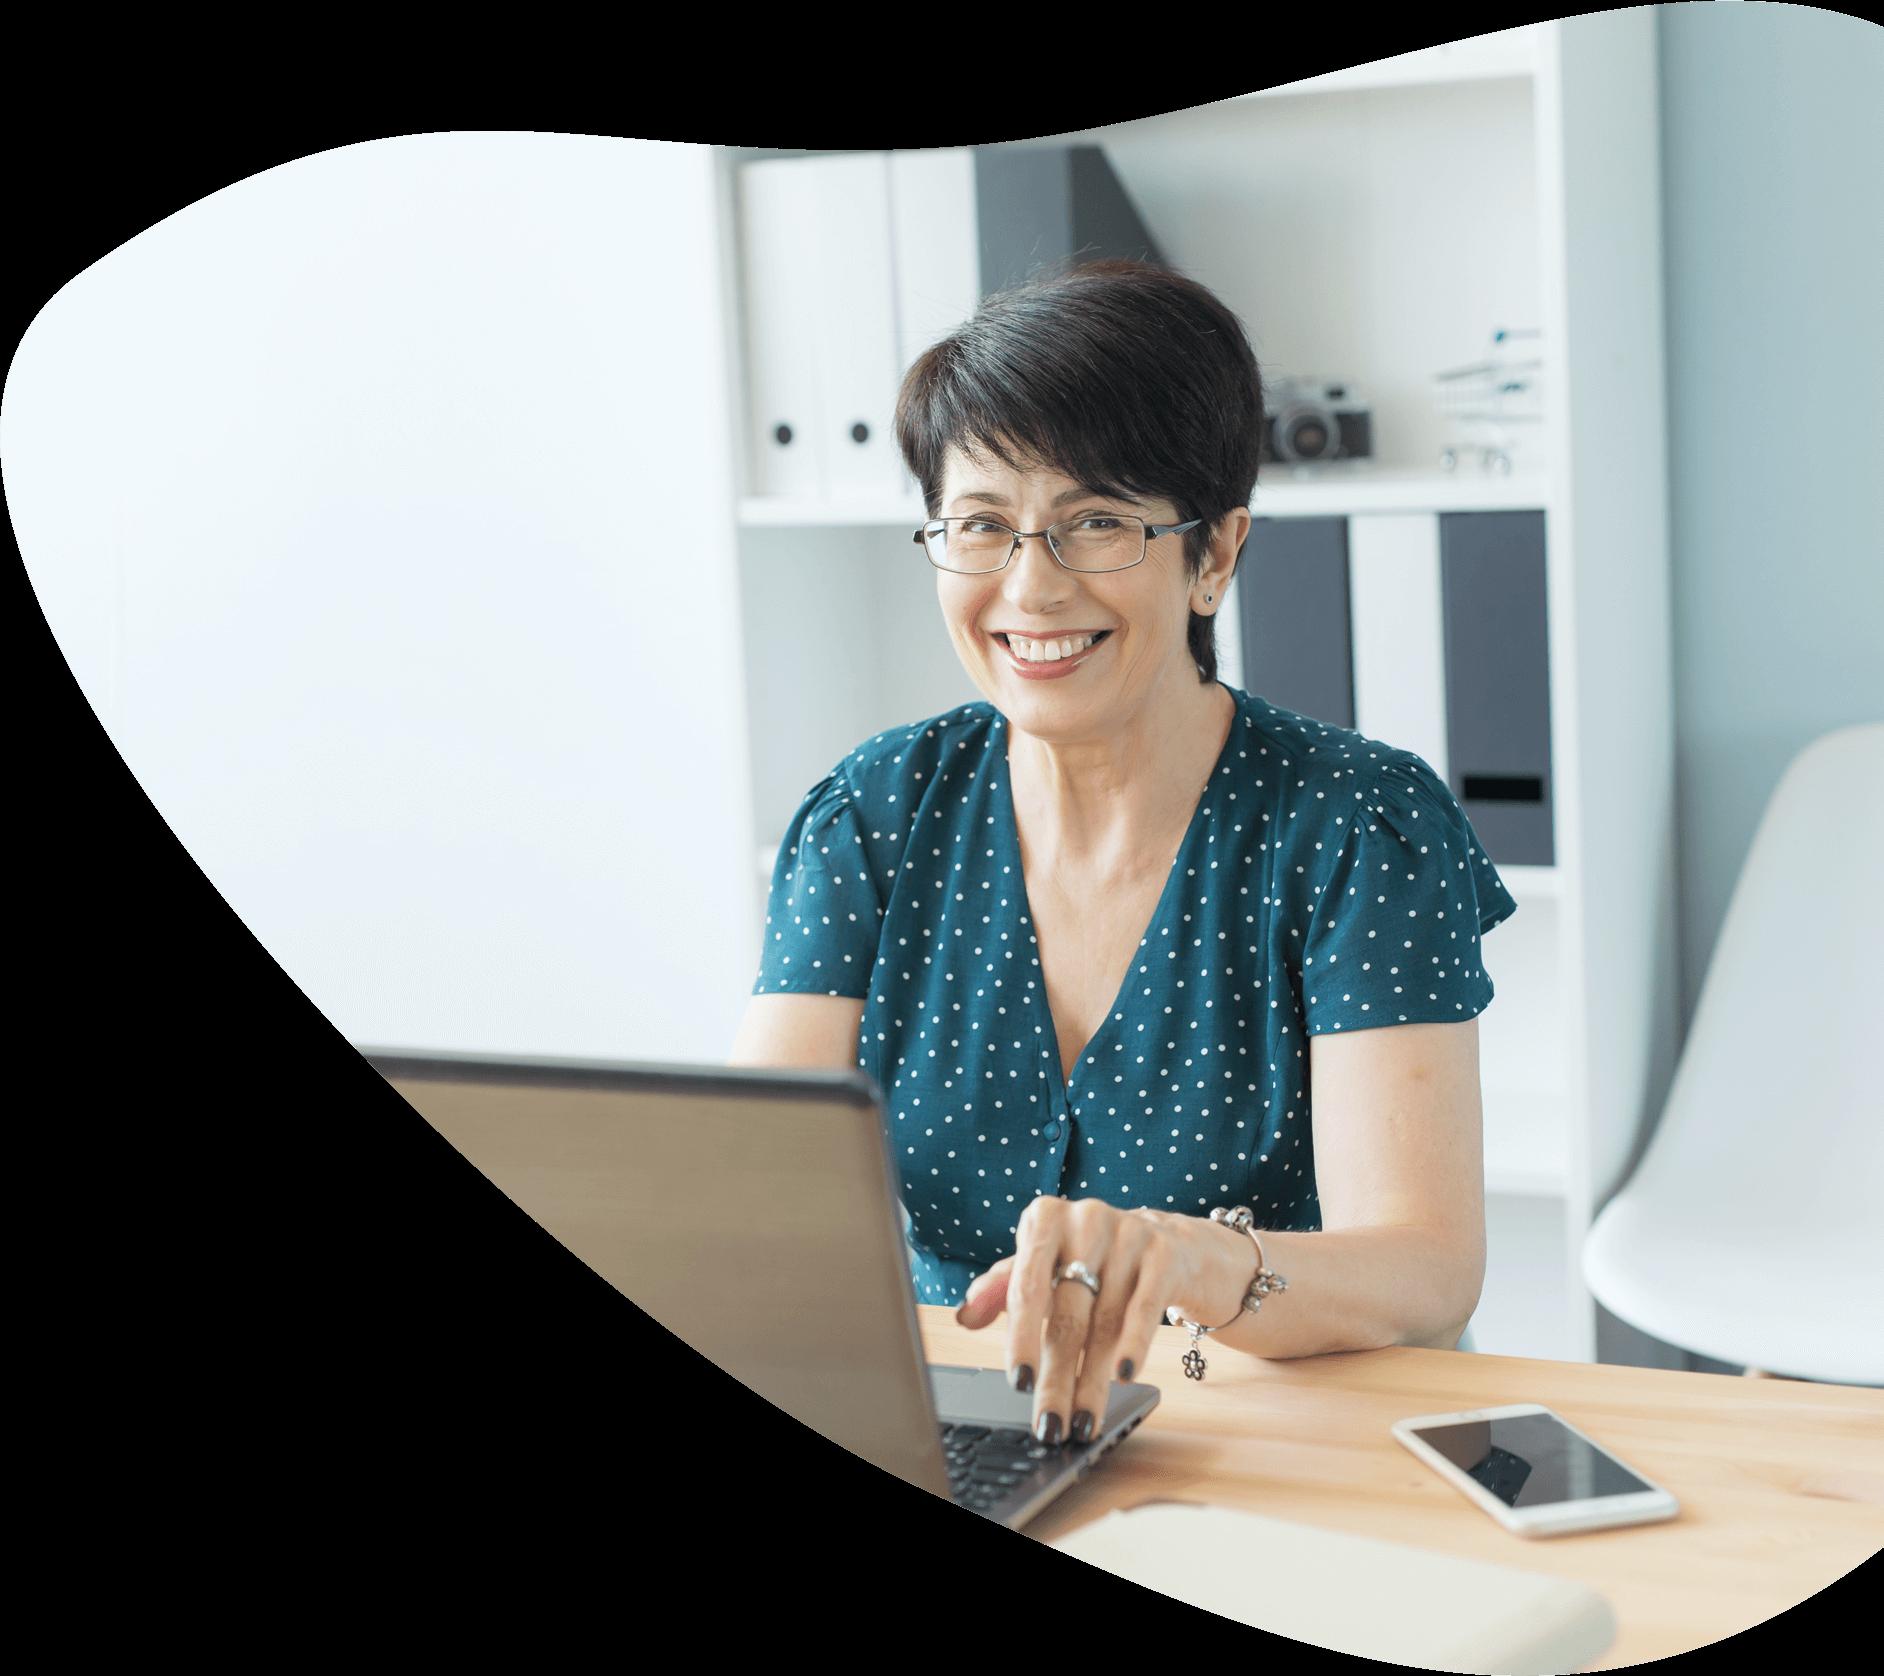 woman at desk, smiling